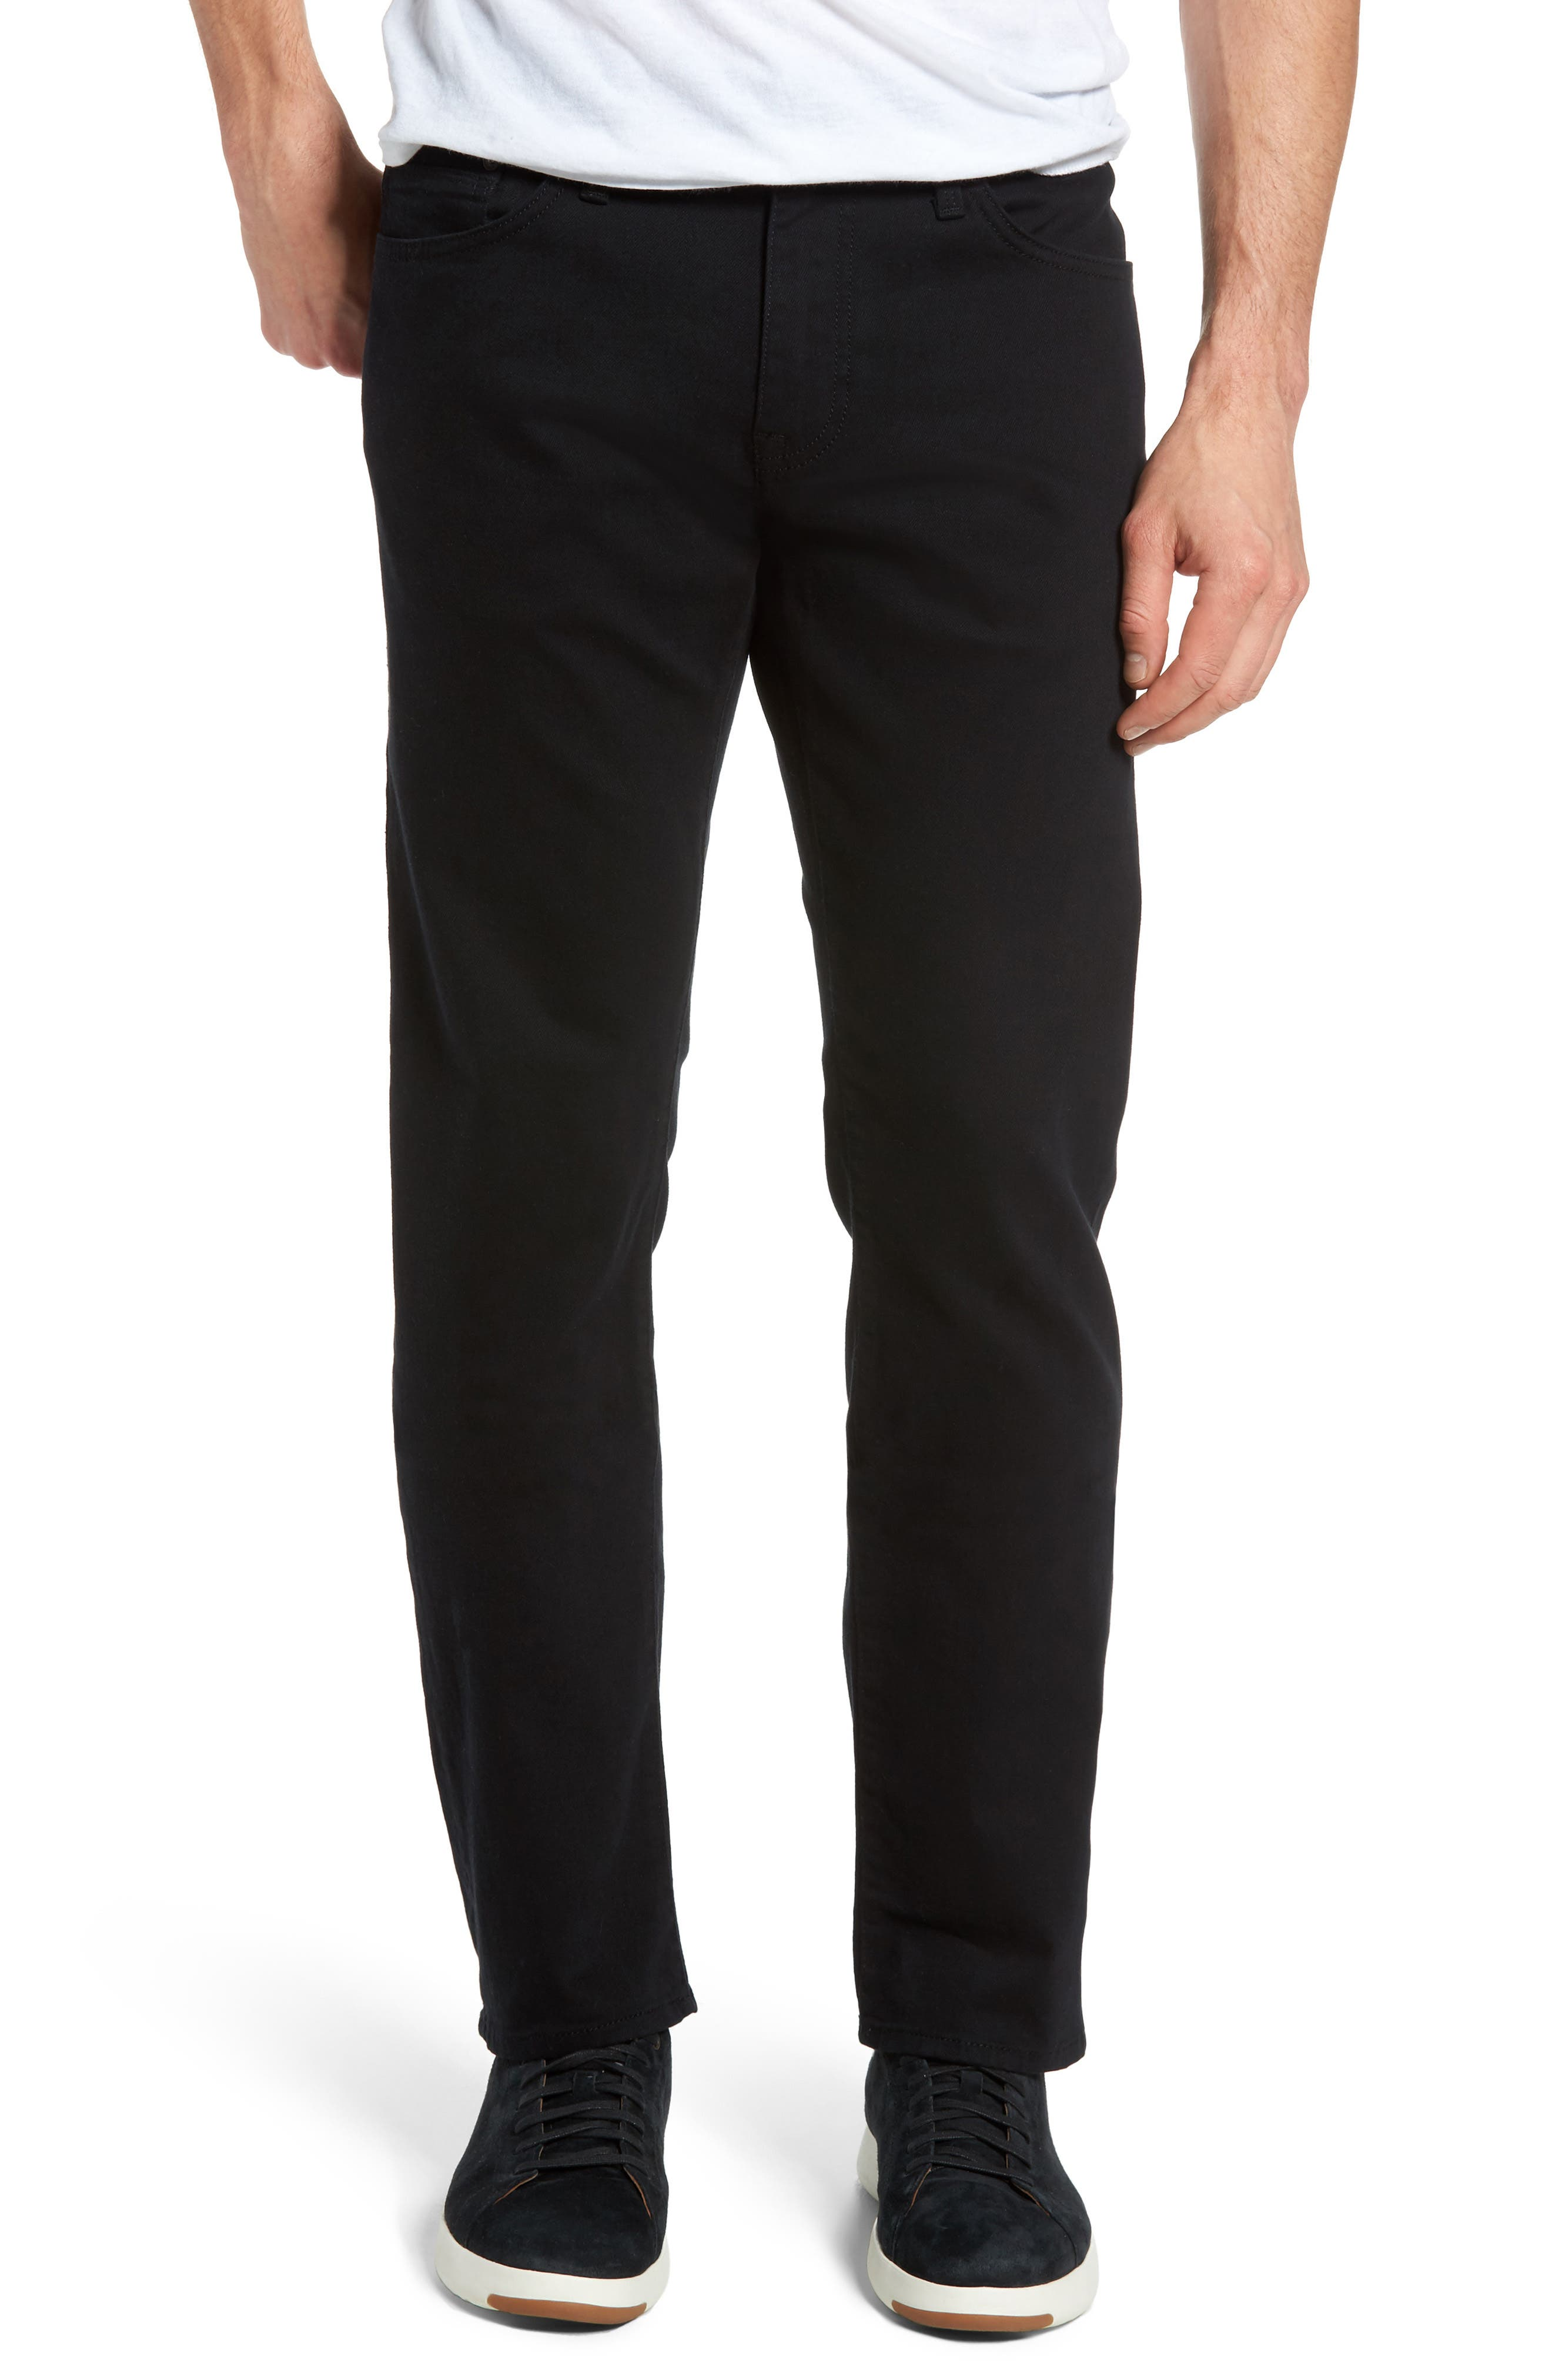 Zach Straight Leg Jeans,                             Main thumbnail 1, color,                             BLACK WILLIAMSBURG